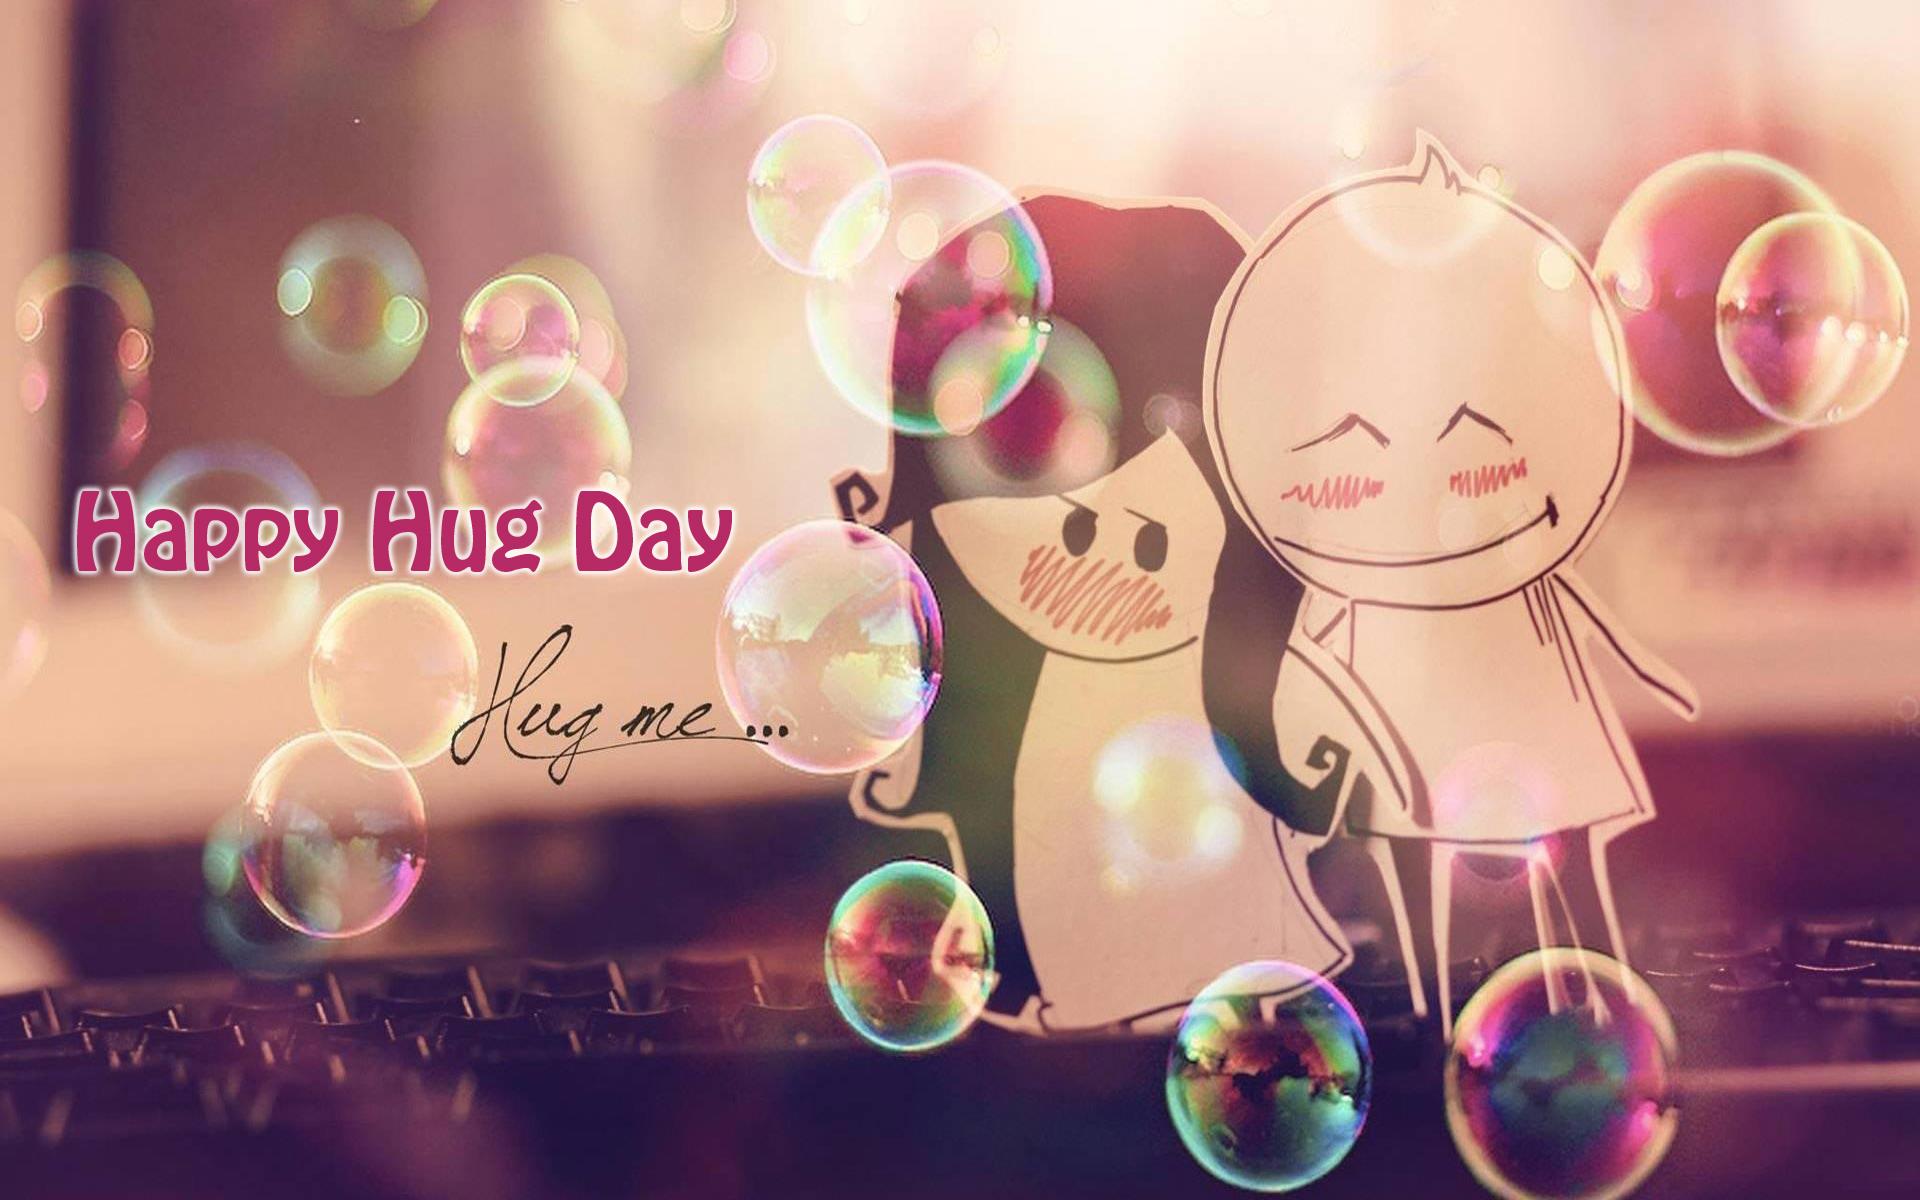 Hug Day Image for Whatsapp